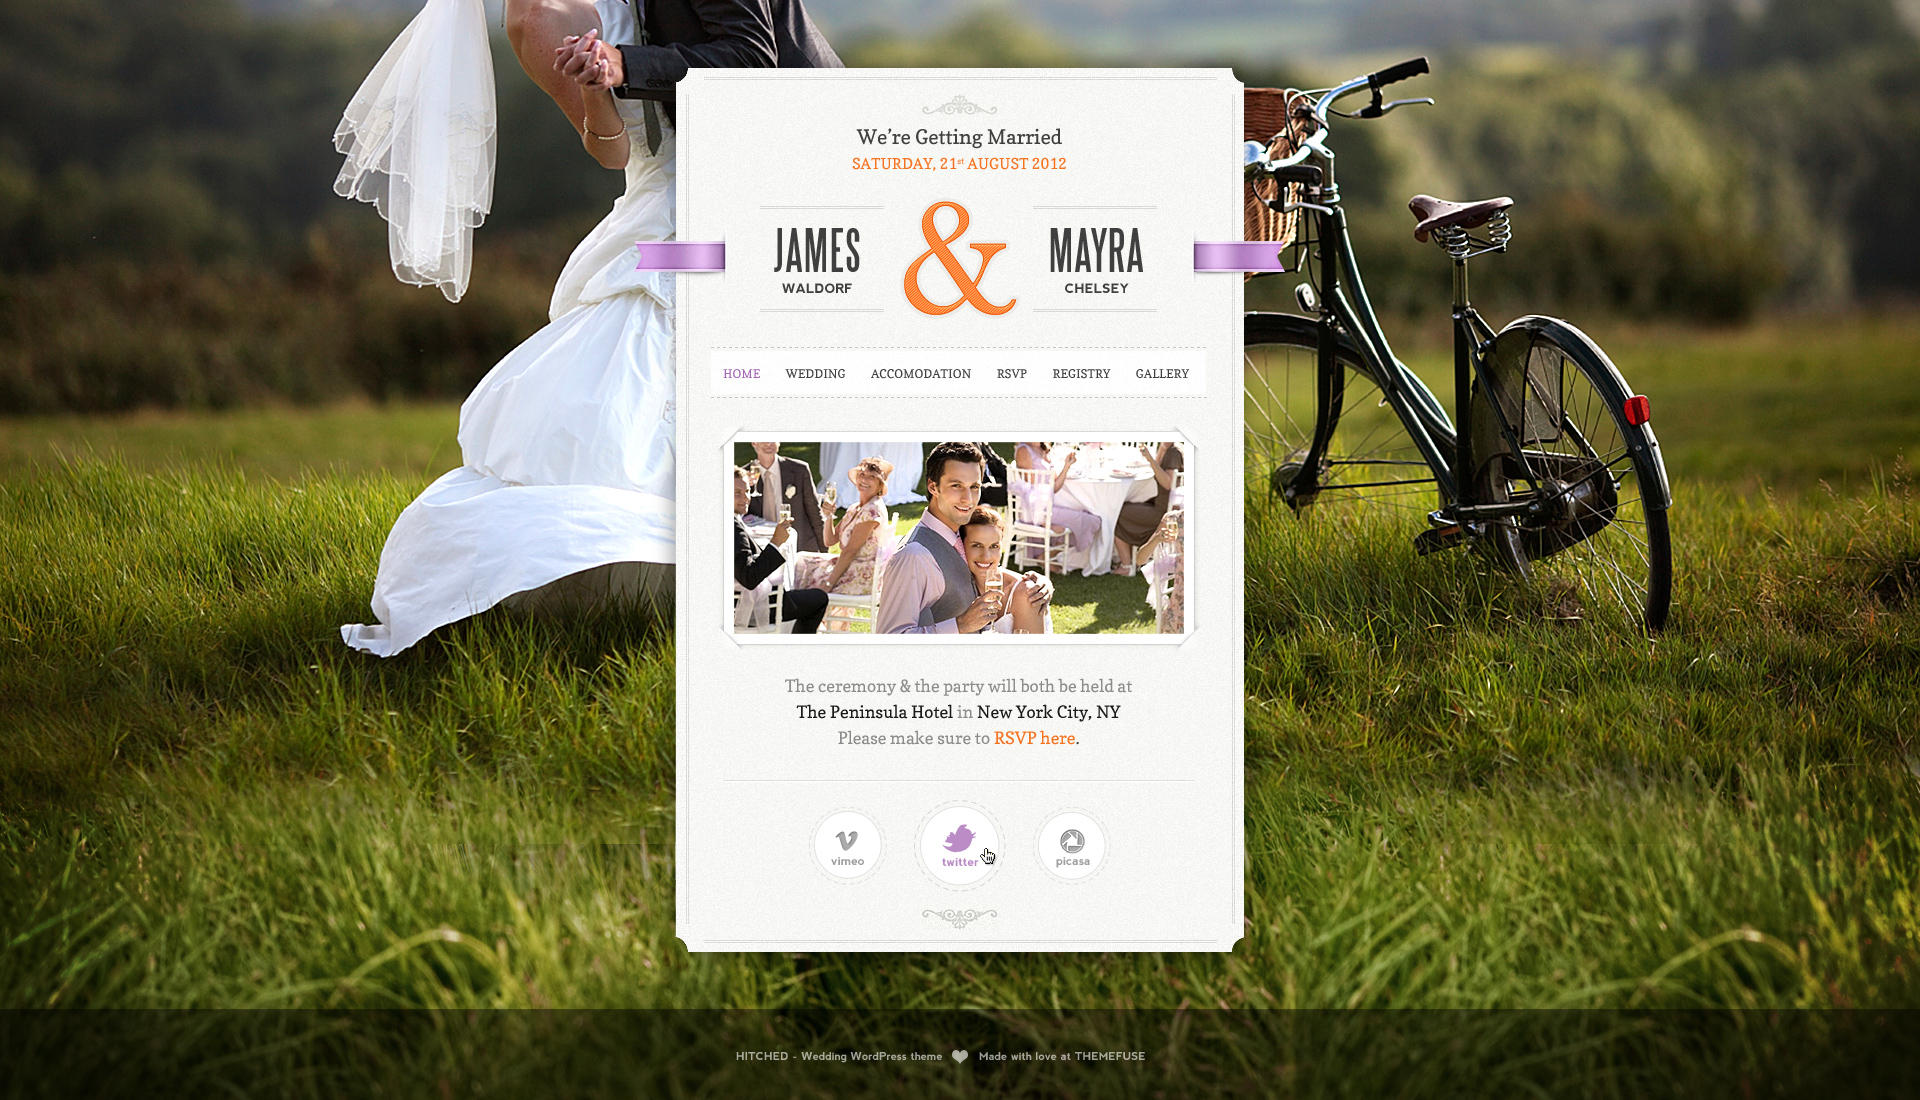 Just Married - Wedding Wordpress theme by ThemeFuse